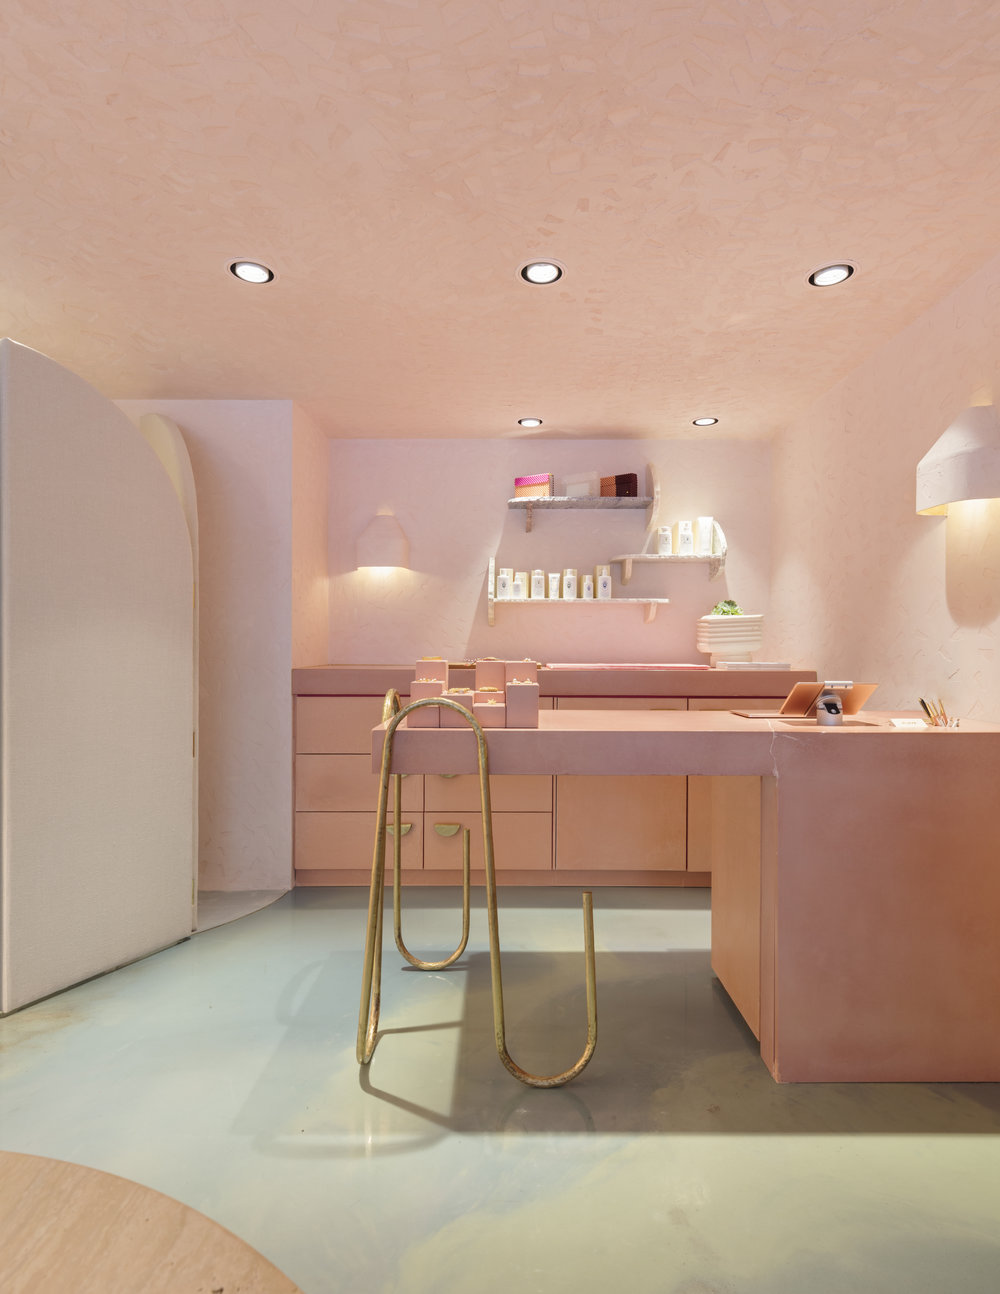 interiors-98.jpg